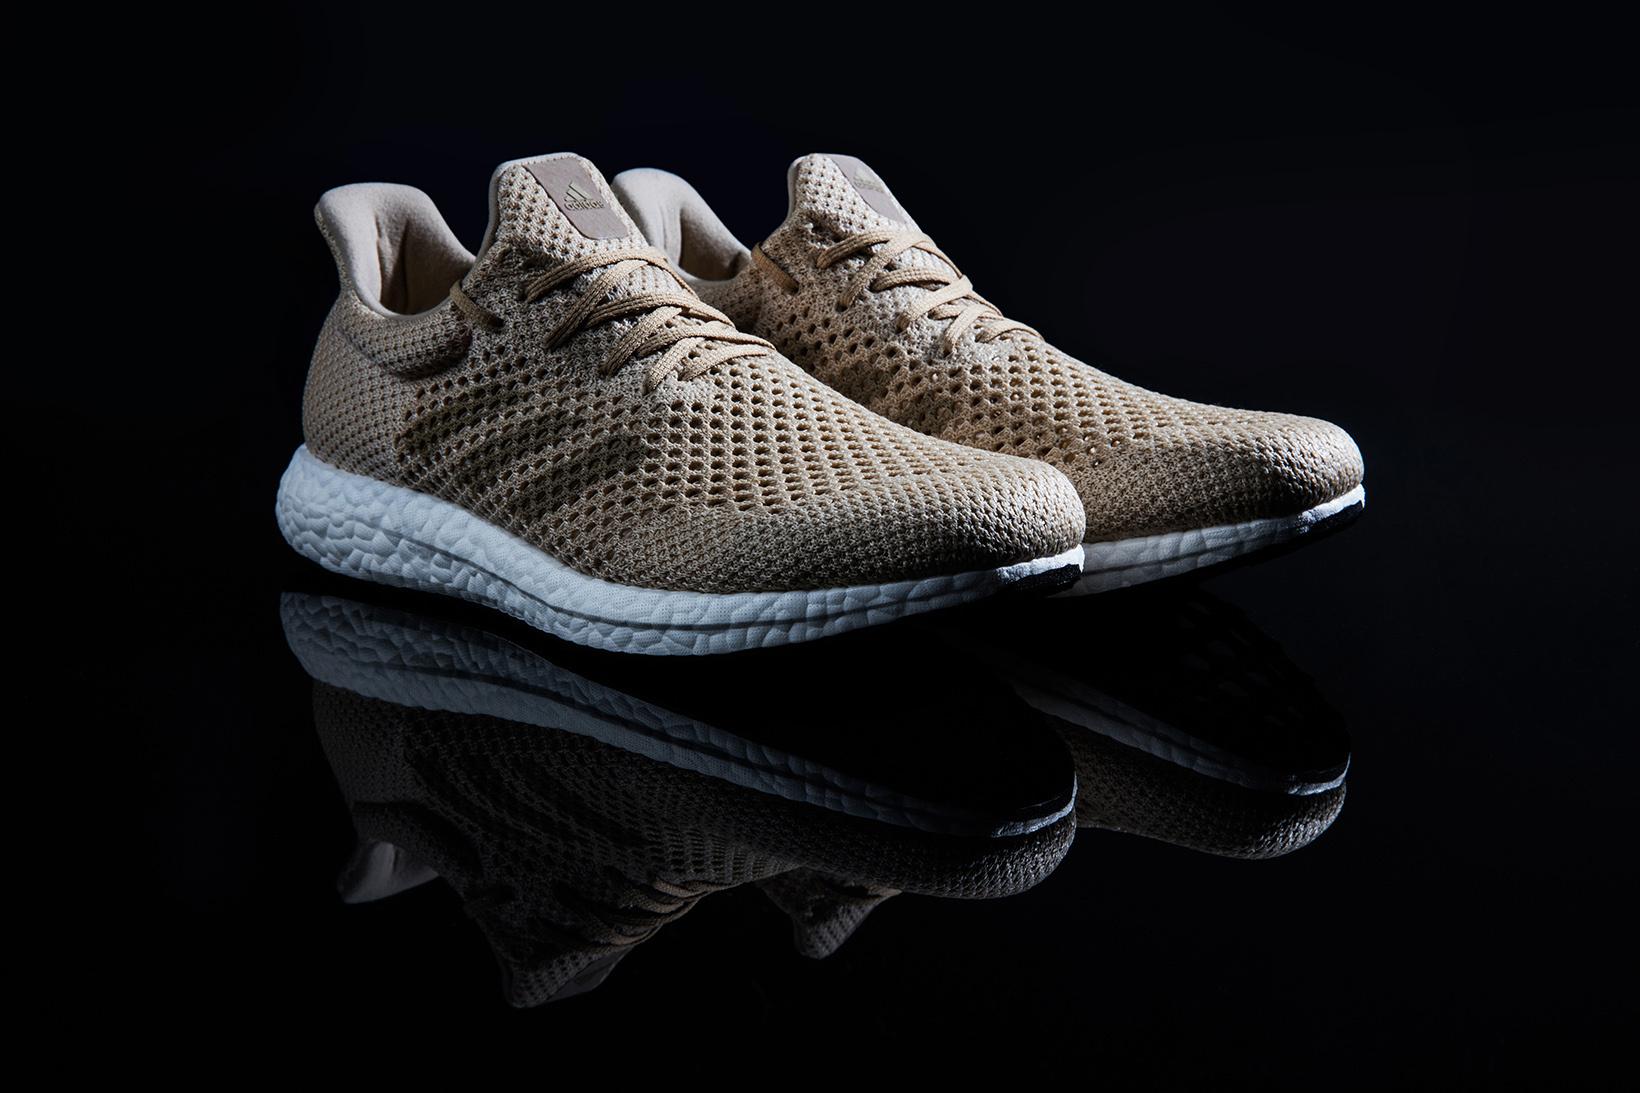 adidas-futurecraft-biofabric-4.jpg